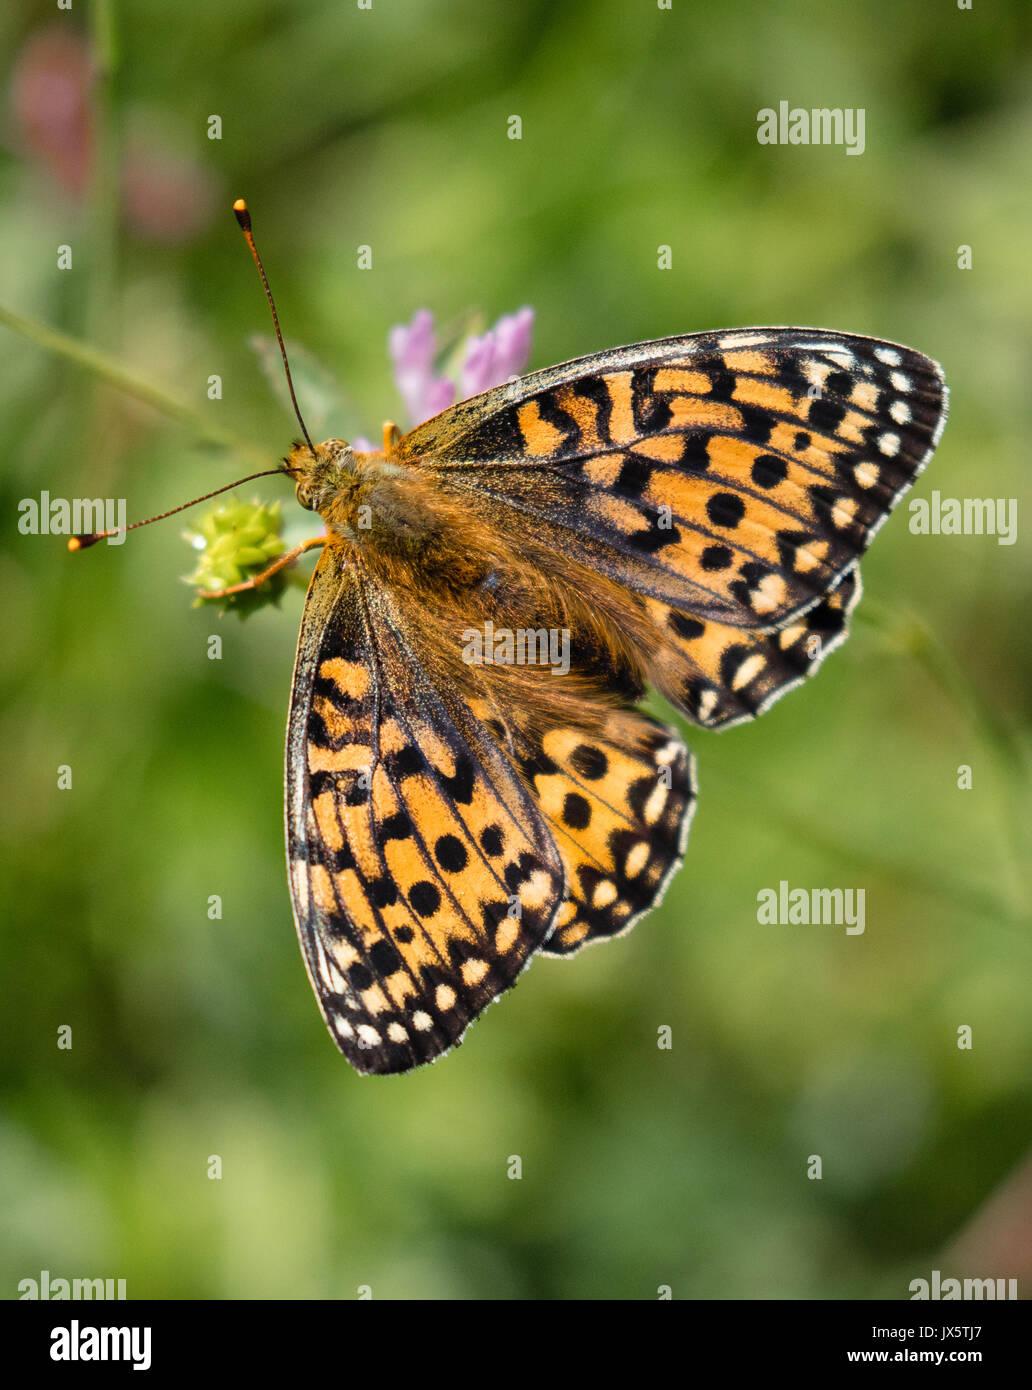 Verde scuro fritillary Argynnis aglaja farfalla femmina di alimentazione UK Immagini Stock